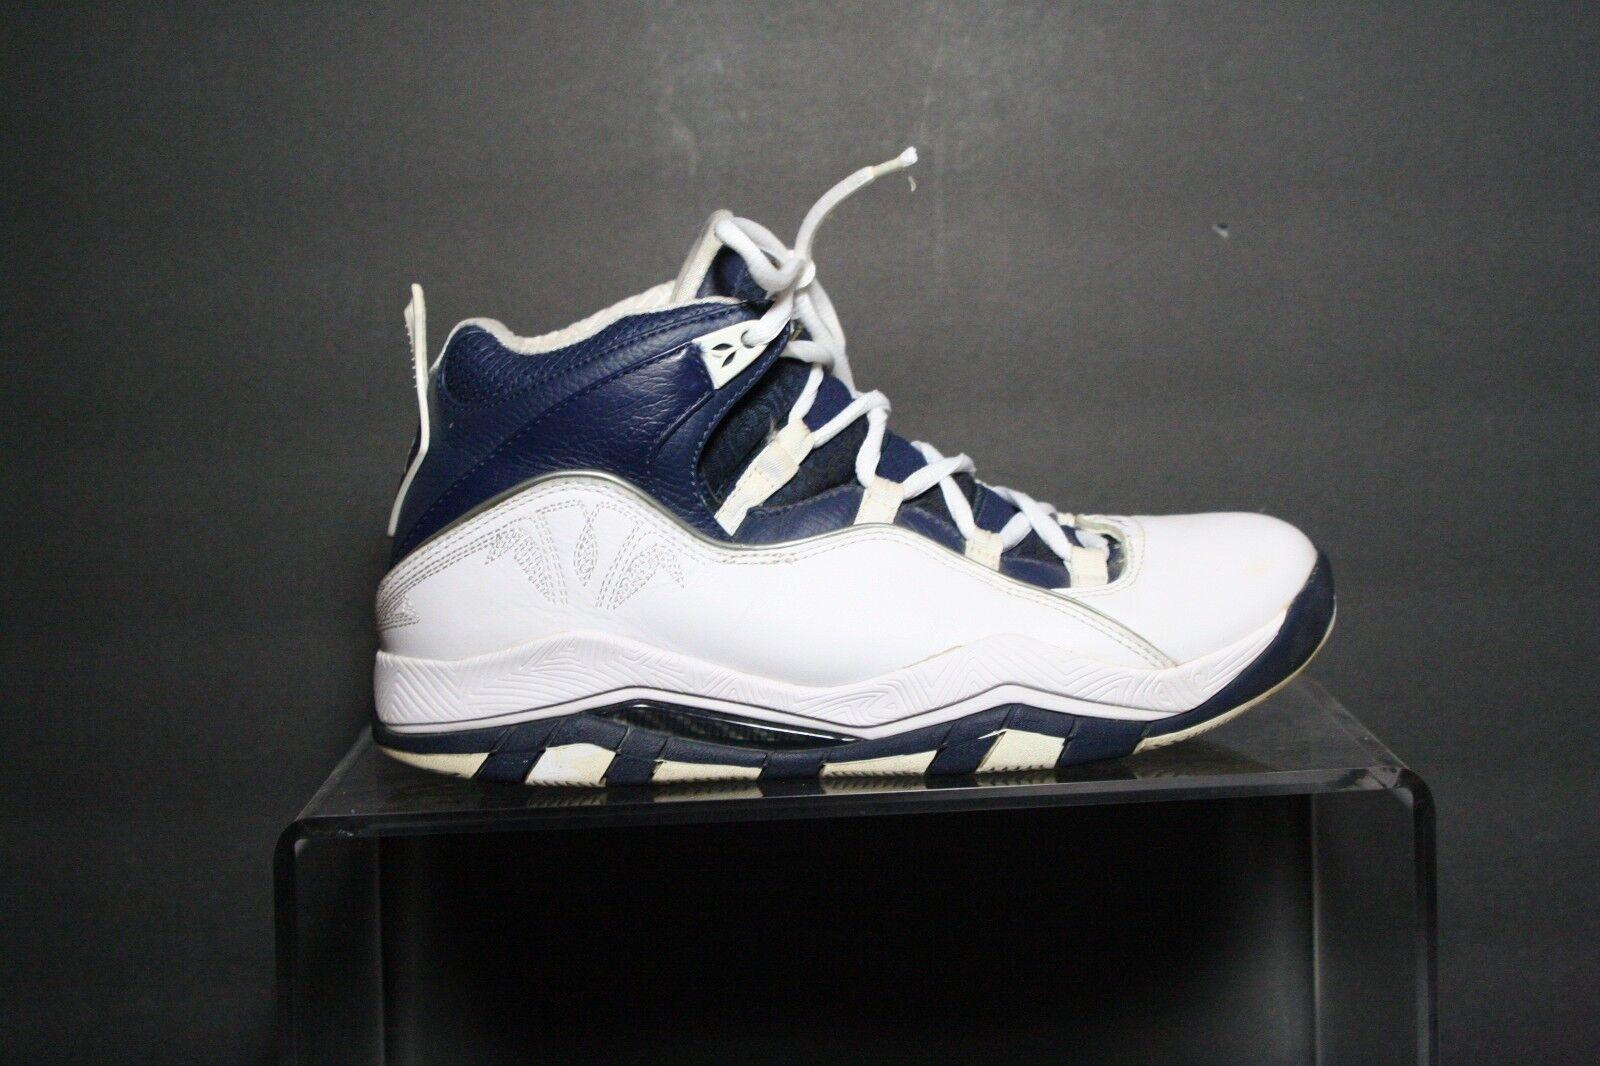 Nike Air Jordan Olympia Beijing 08' Sneakers Hipster Multi bluee Men's 7.5 B-ball